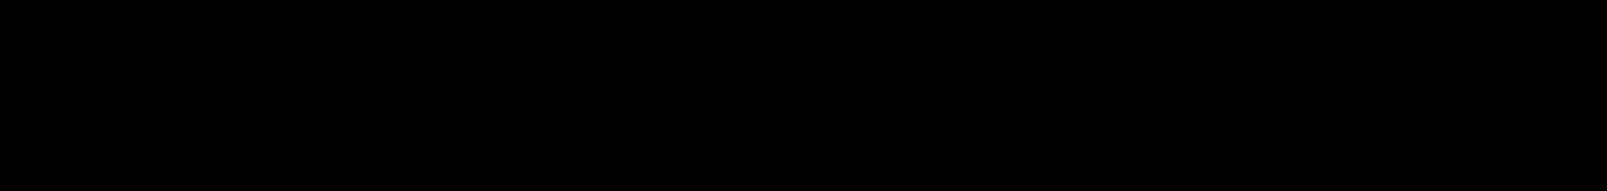 Nikaia Script Light